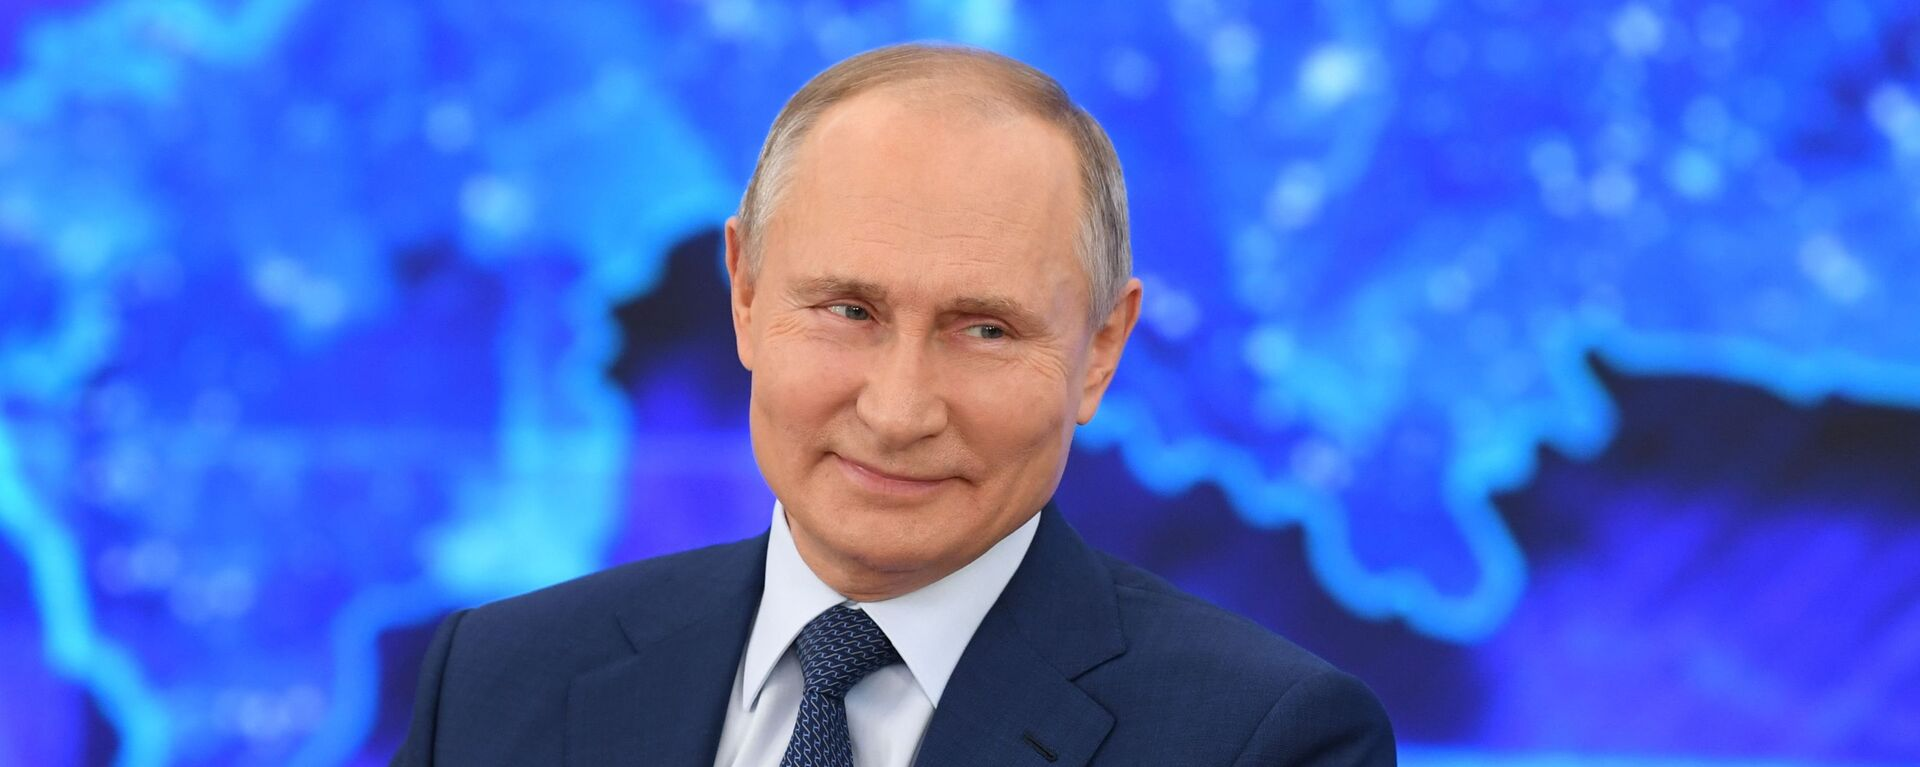 Ежегодная пресс-конференция президента РФ В. Путина - Sputnik Таджикистан, 1920, 19.09.2021